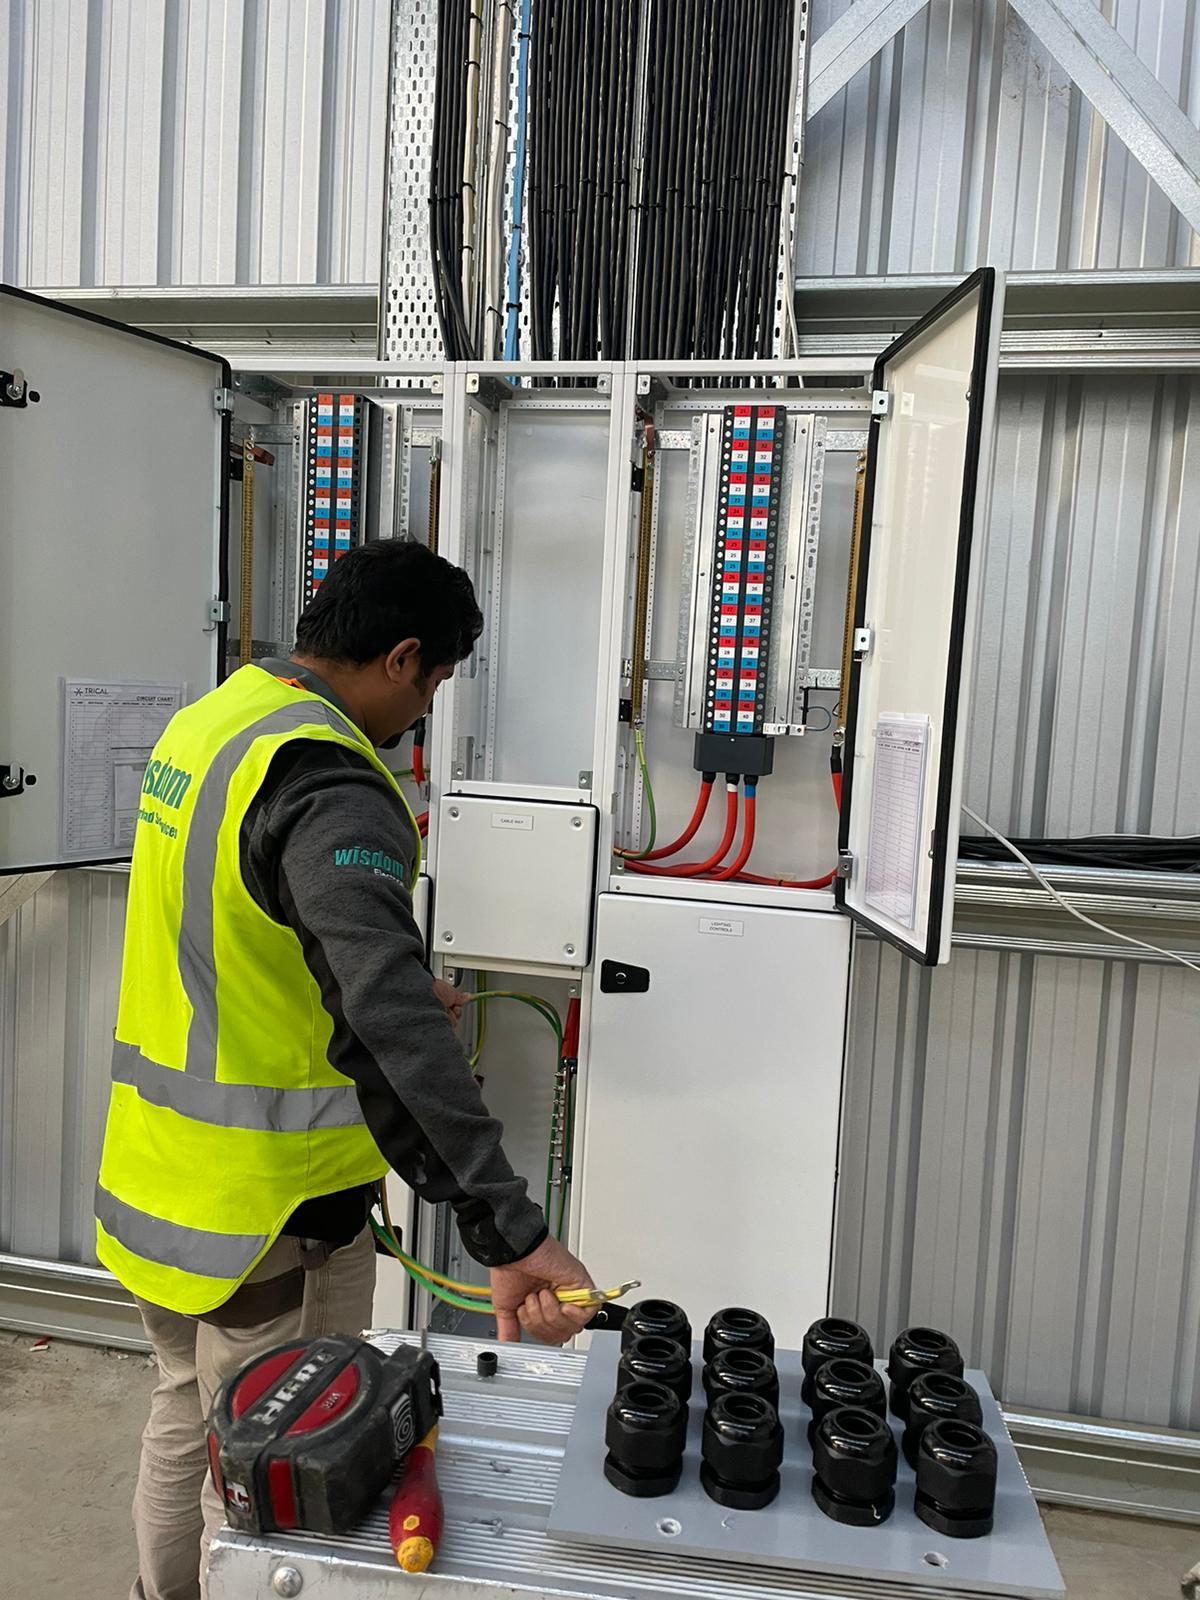 Electricians examining a circuit breaker panel